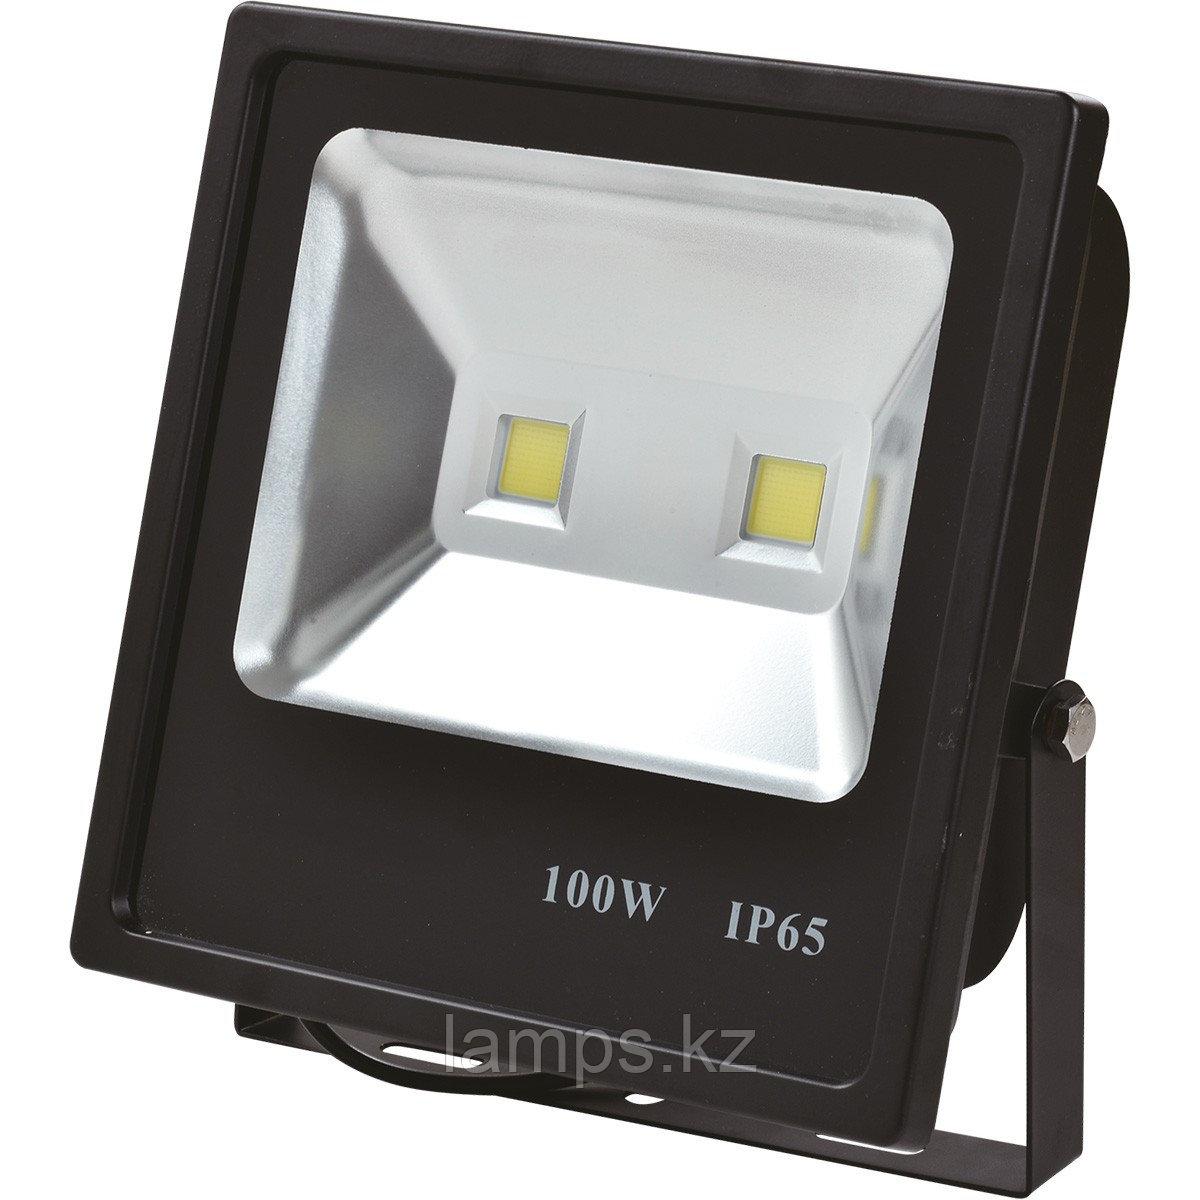 Светодиодный прожектор LED TS100 100W 6000K Black